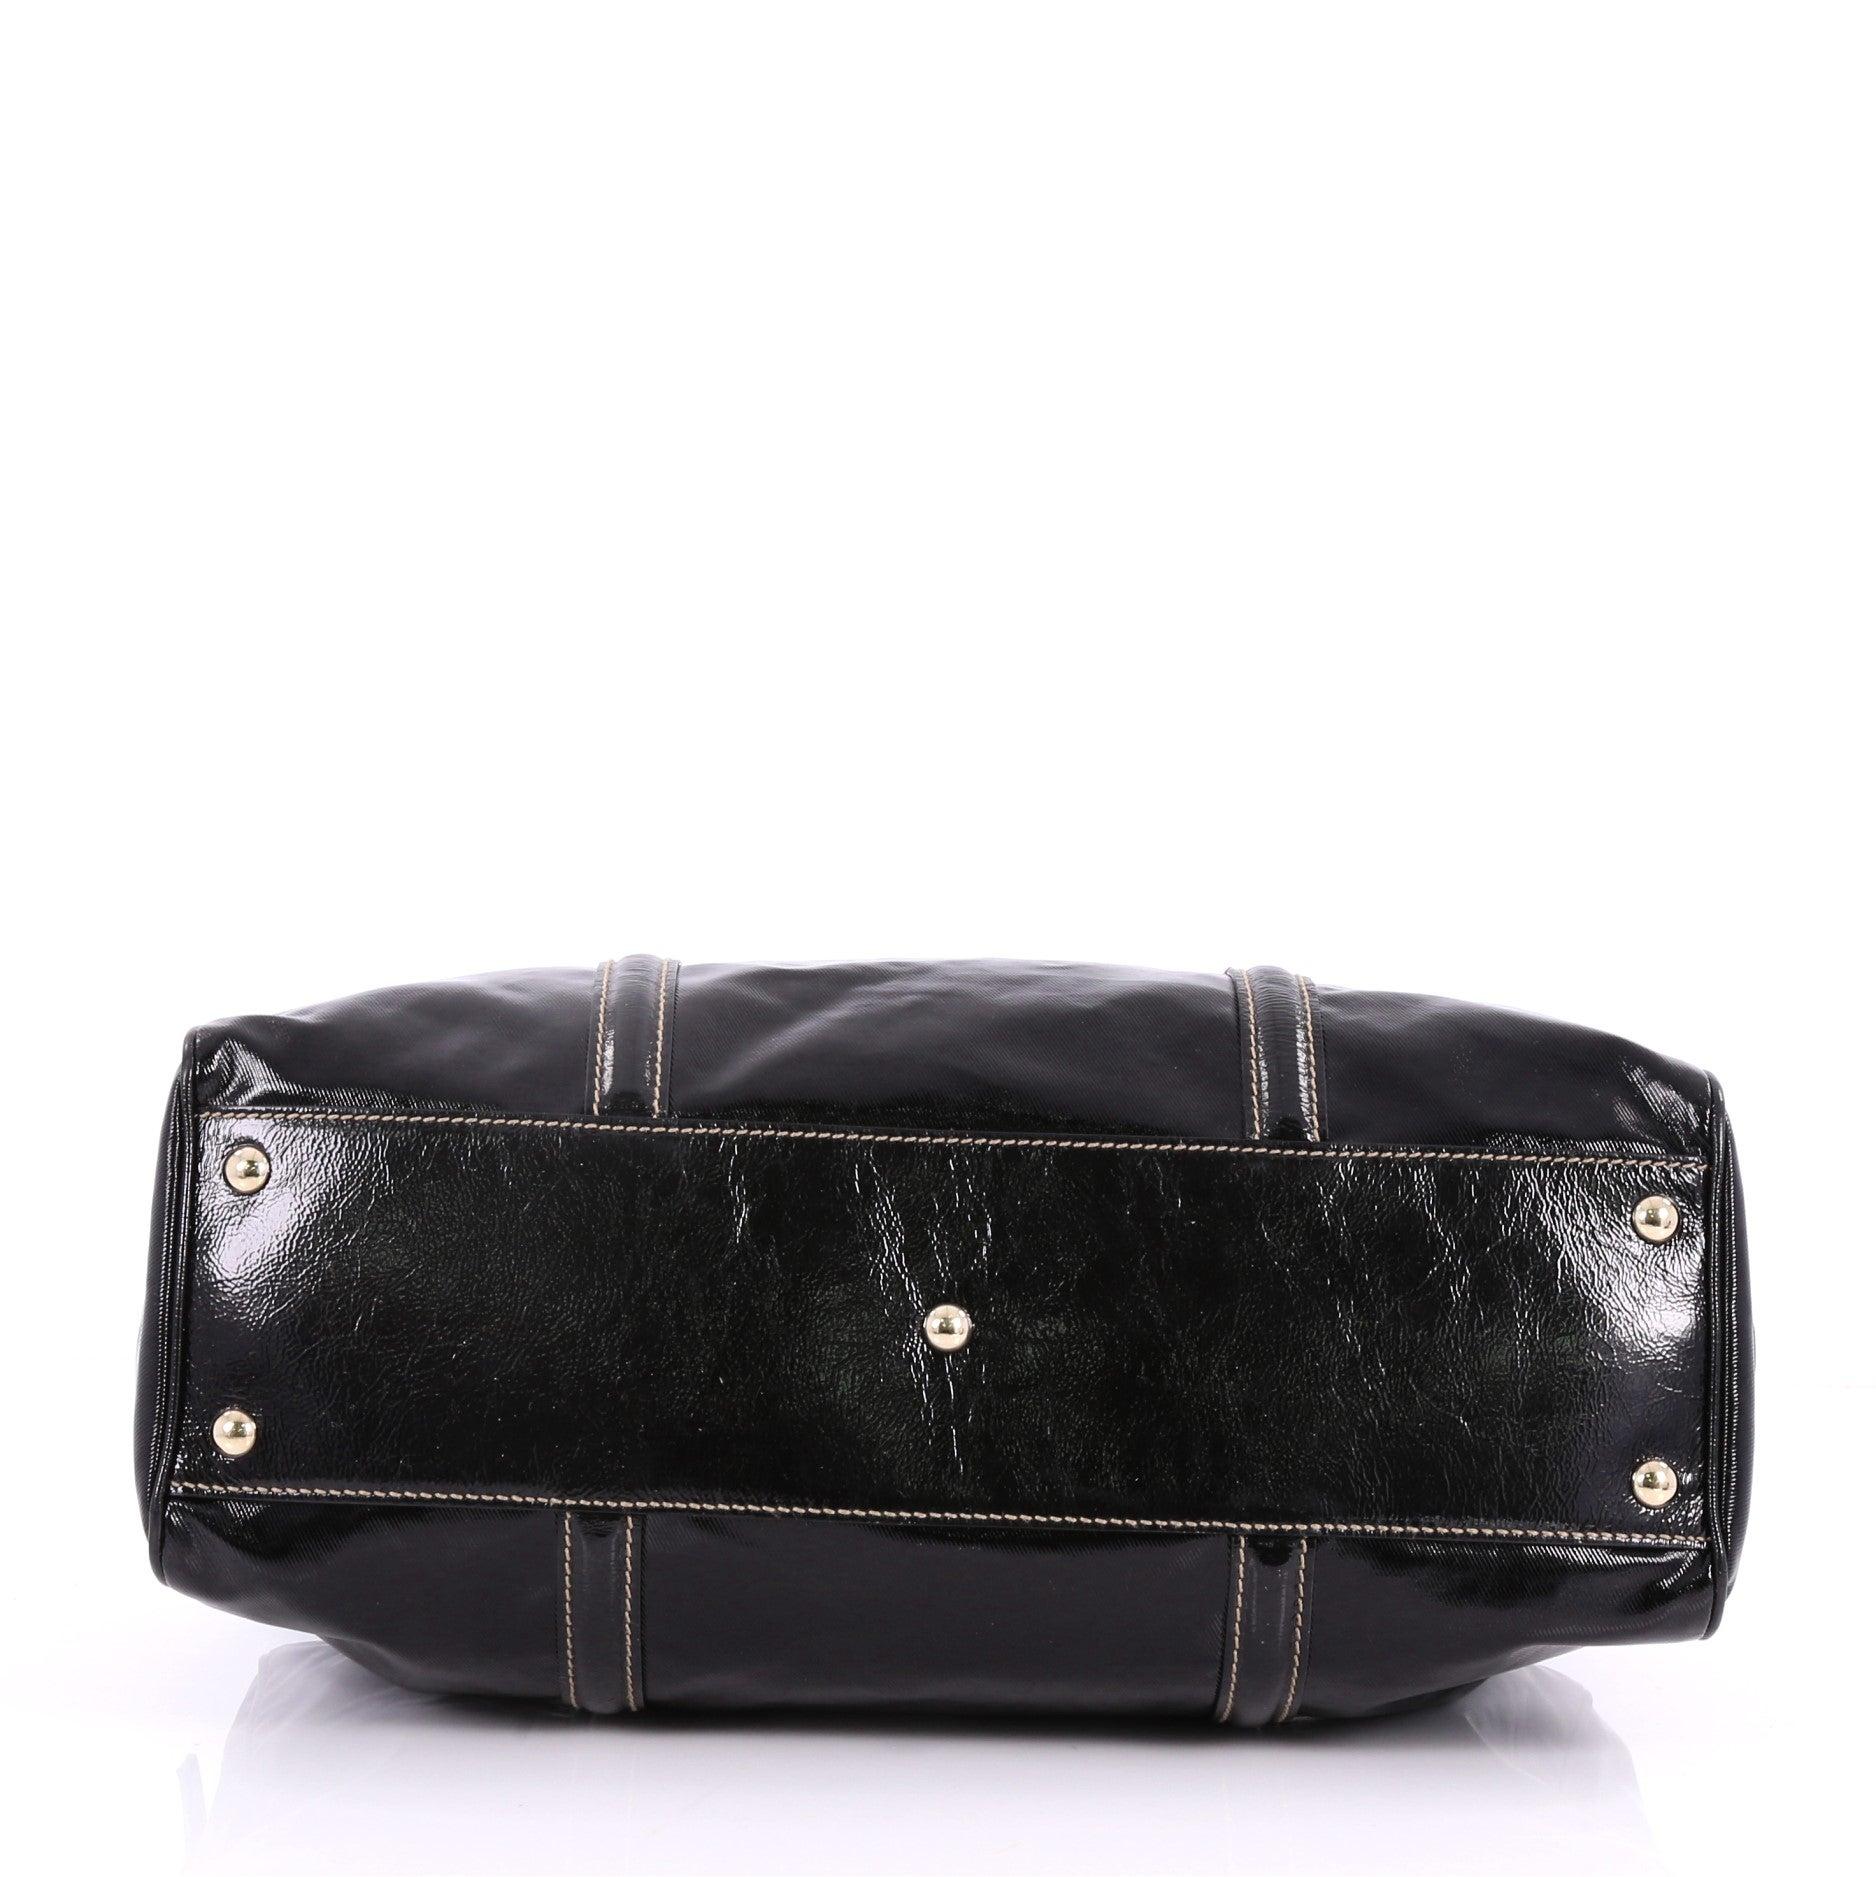 5ef1bfe81577 Gucci Britt Web Boston Duffle Bag Dialux Coated Canvas Medium at 1stdibs